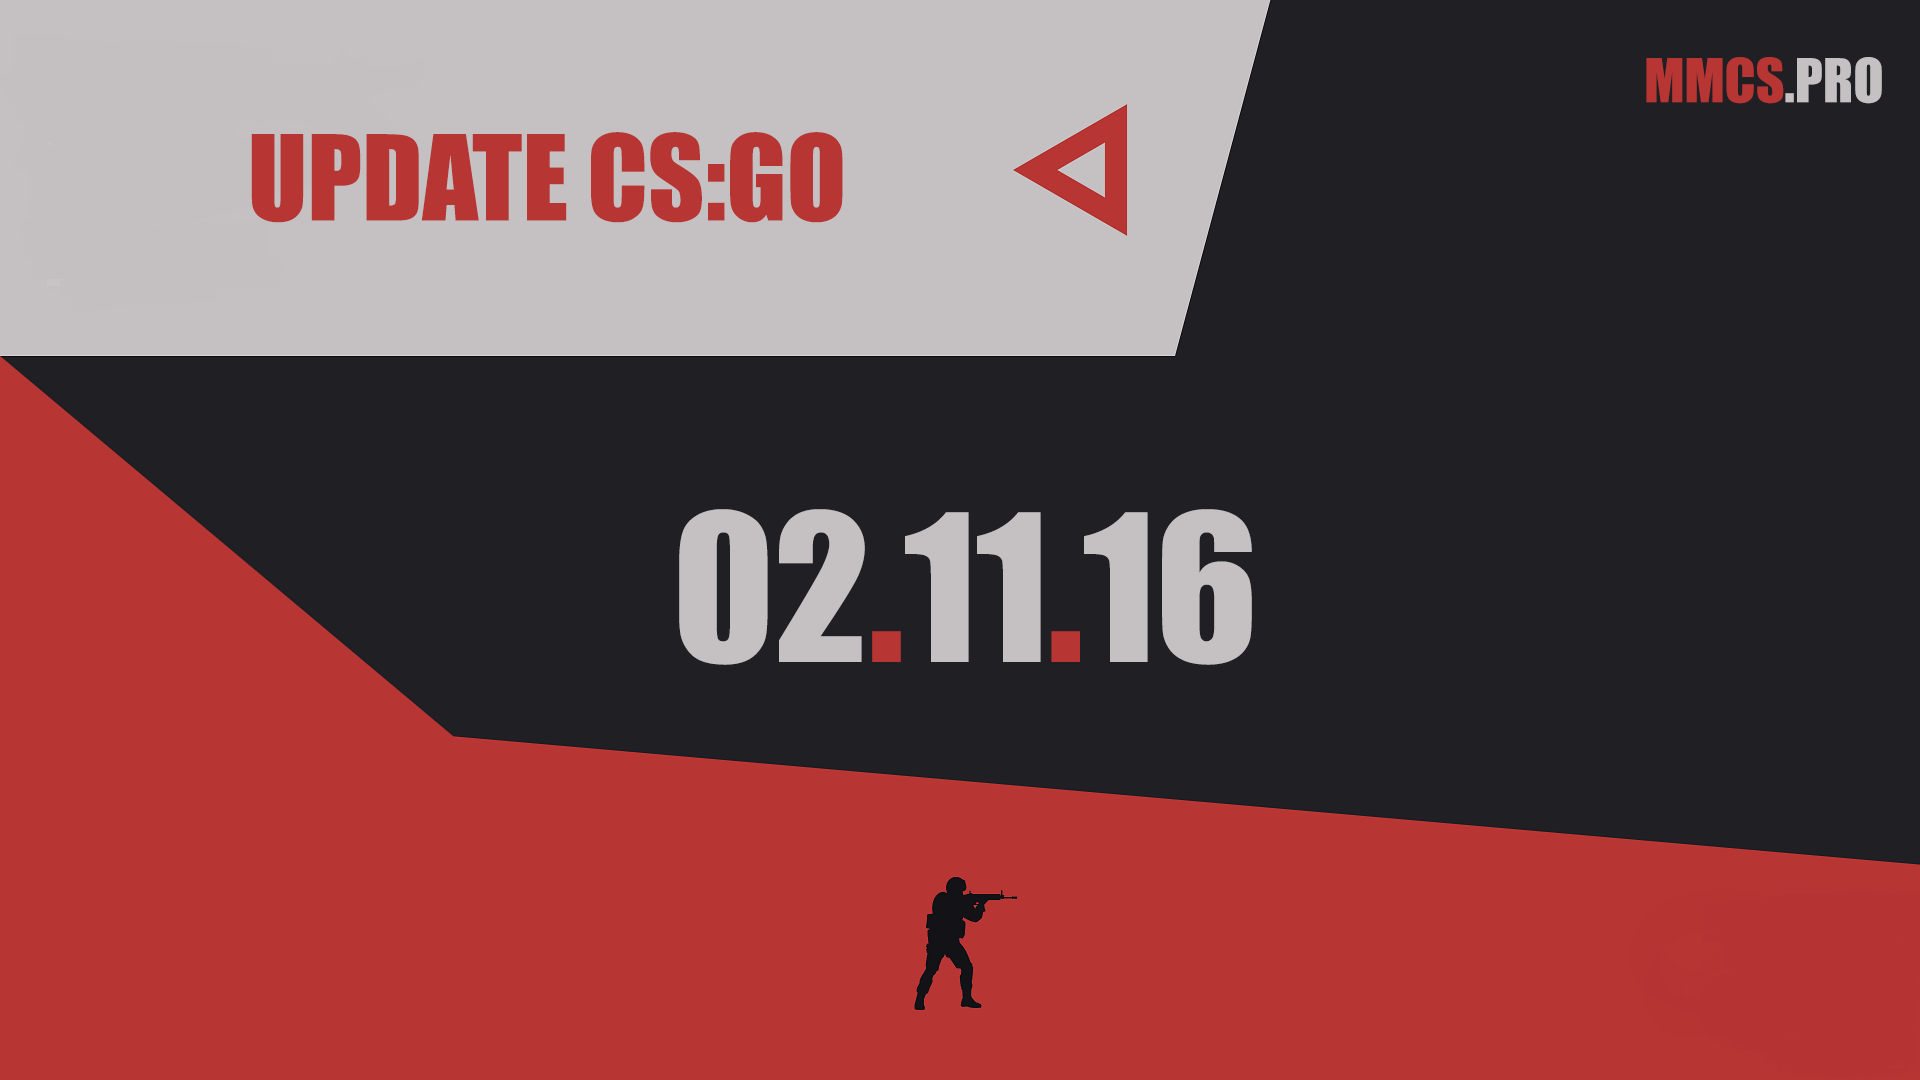 https://mmcs.pro/update-csgo-02-11-2016-valve/